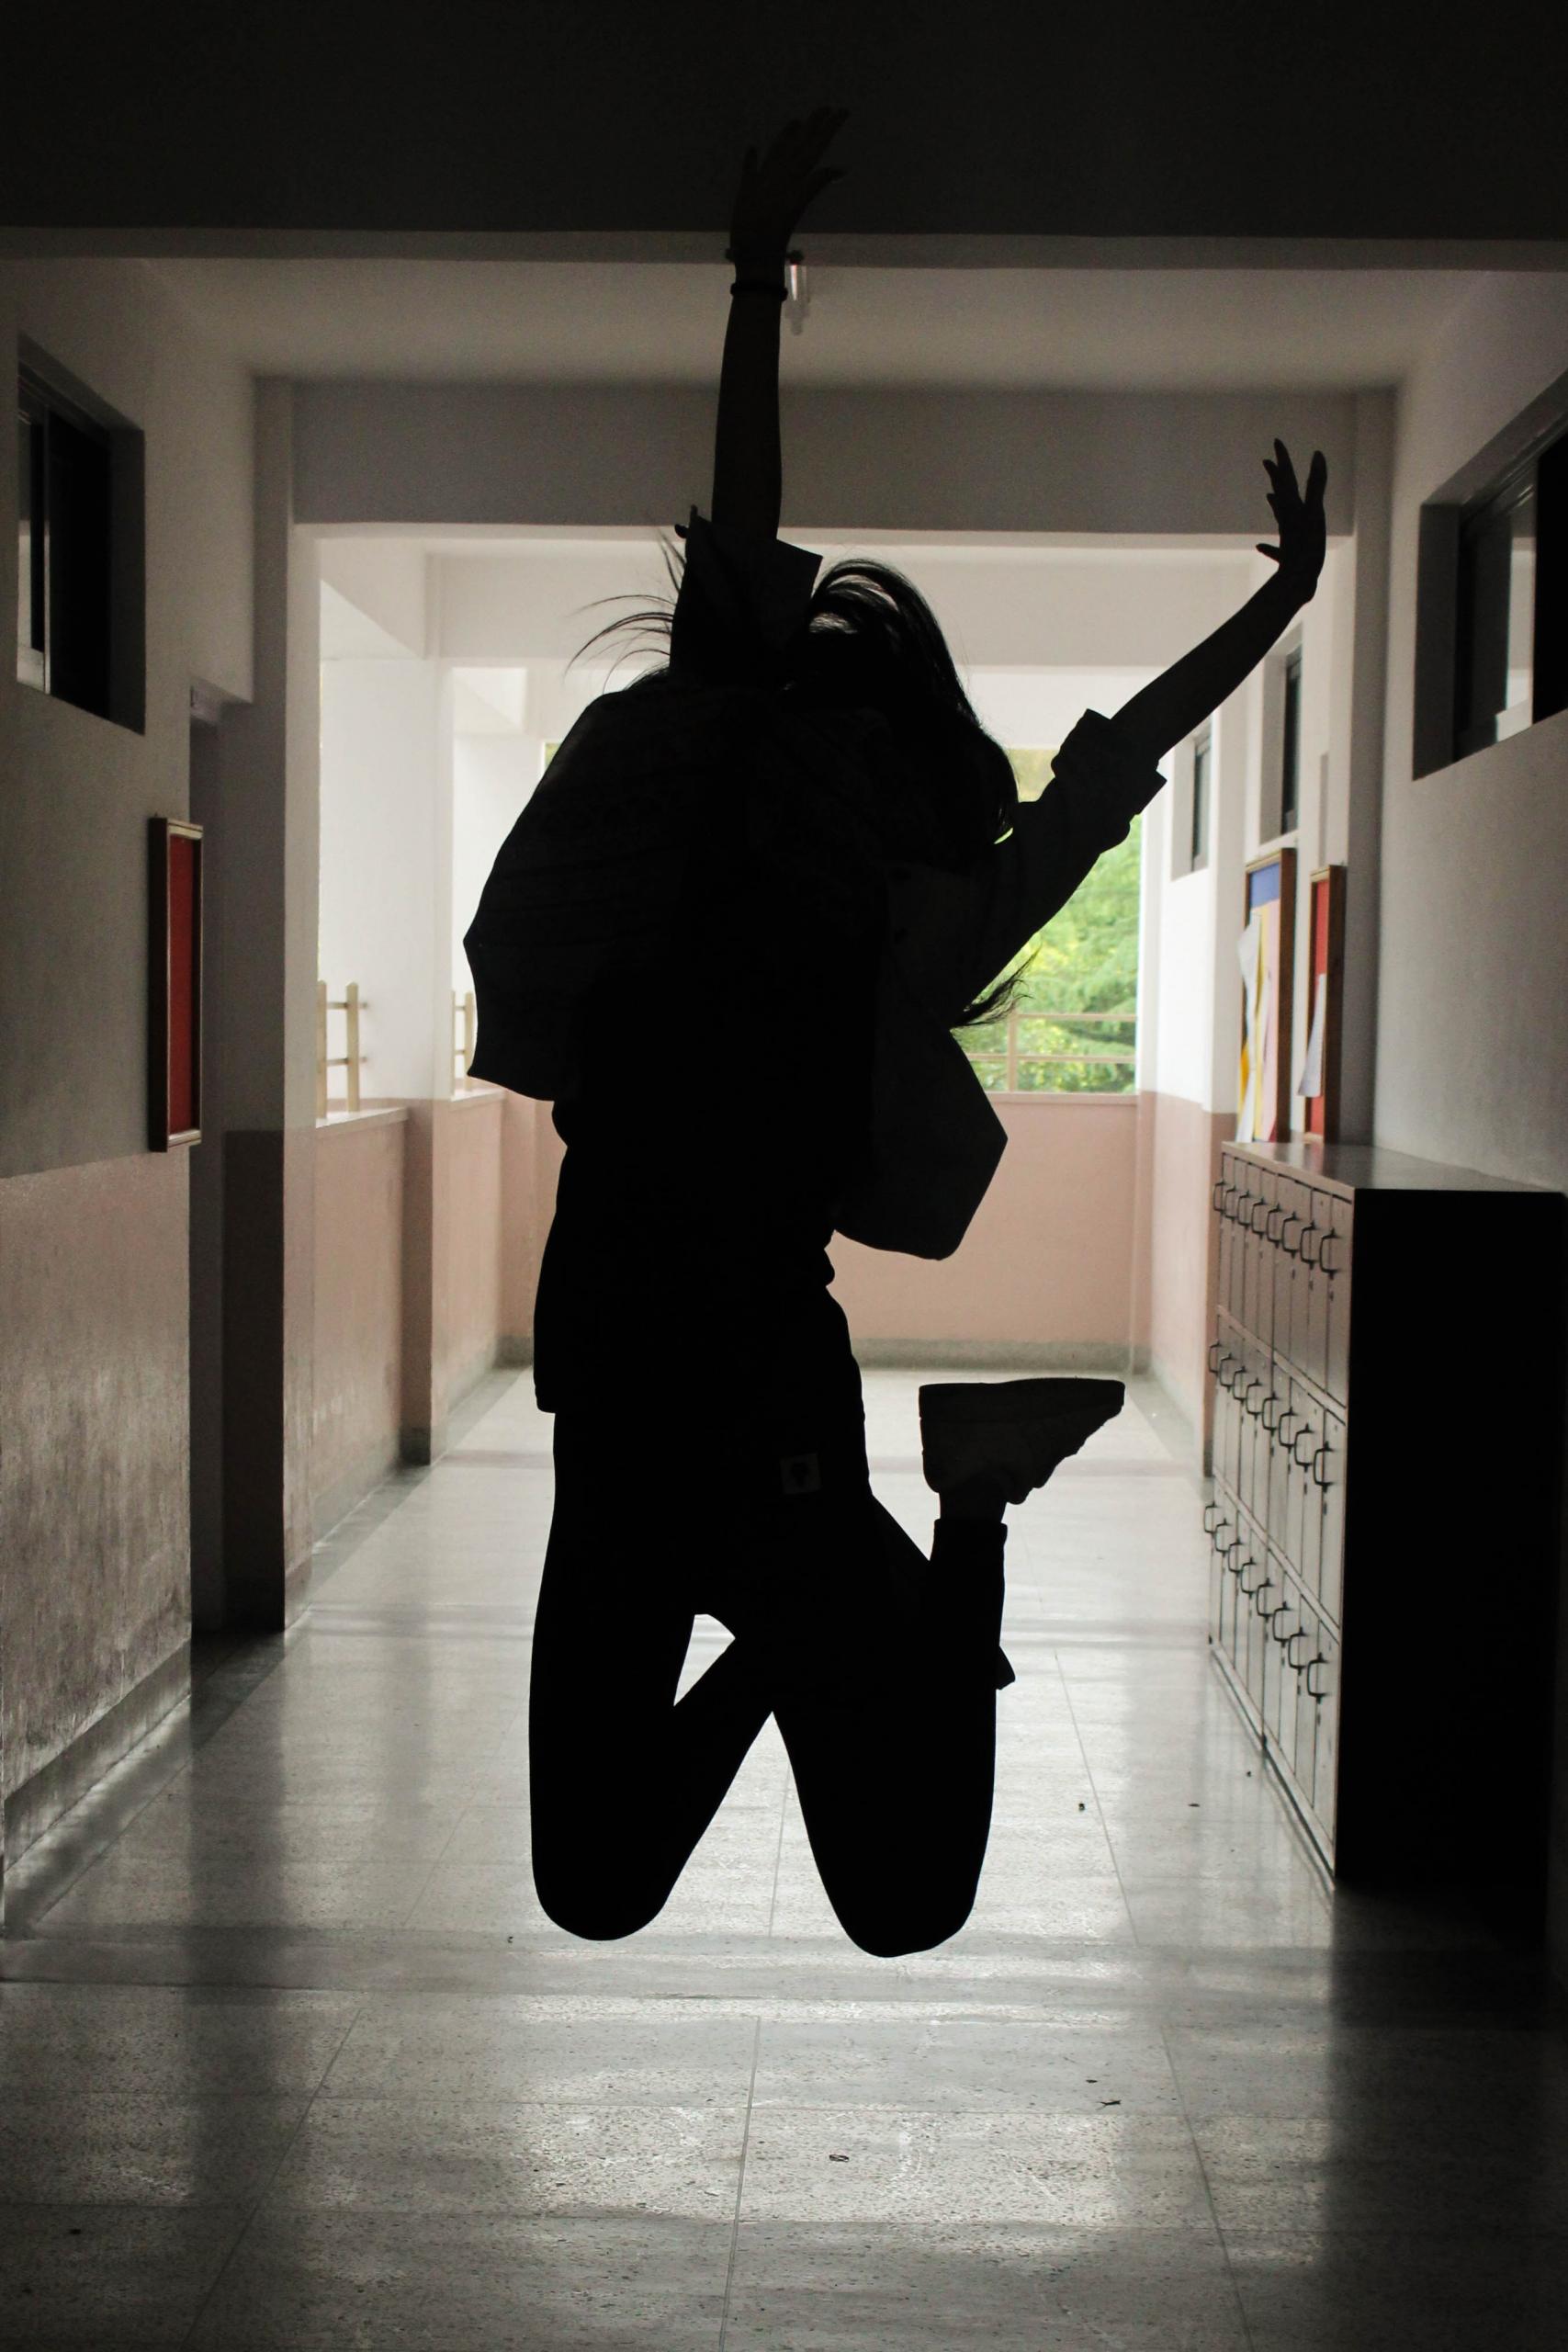 jumping school hallway